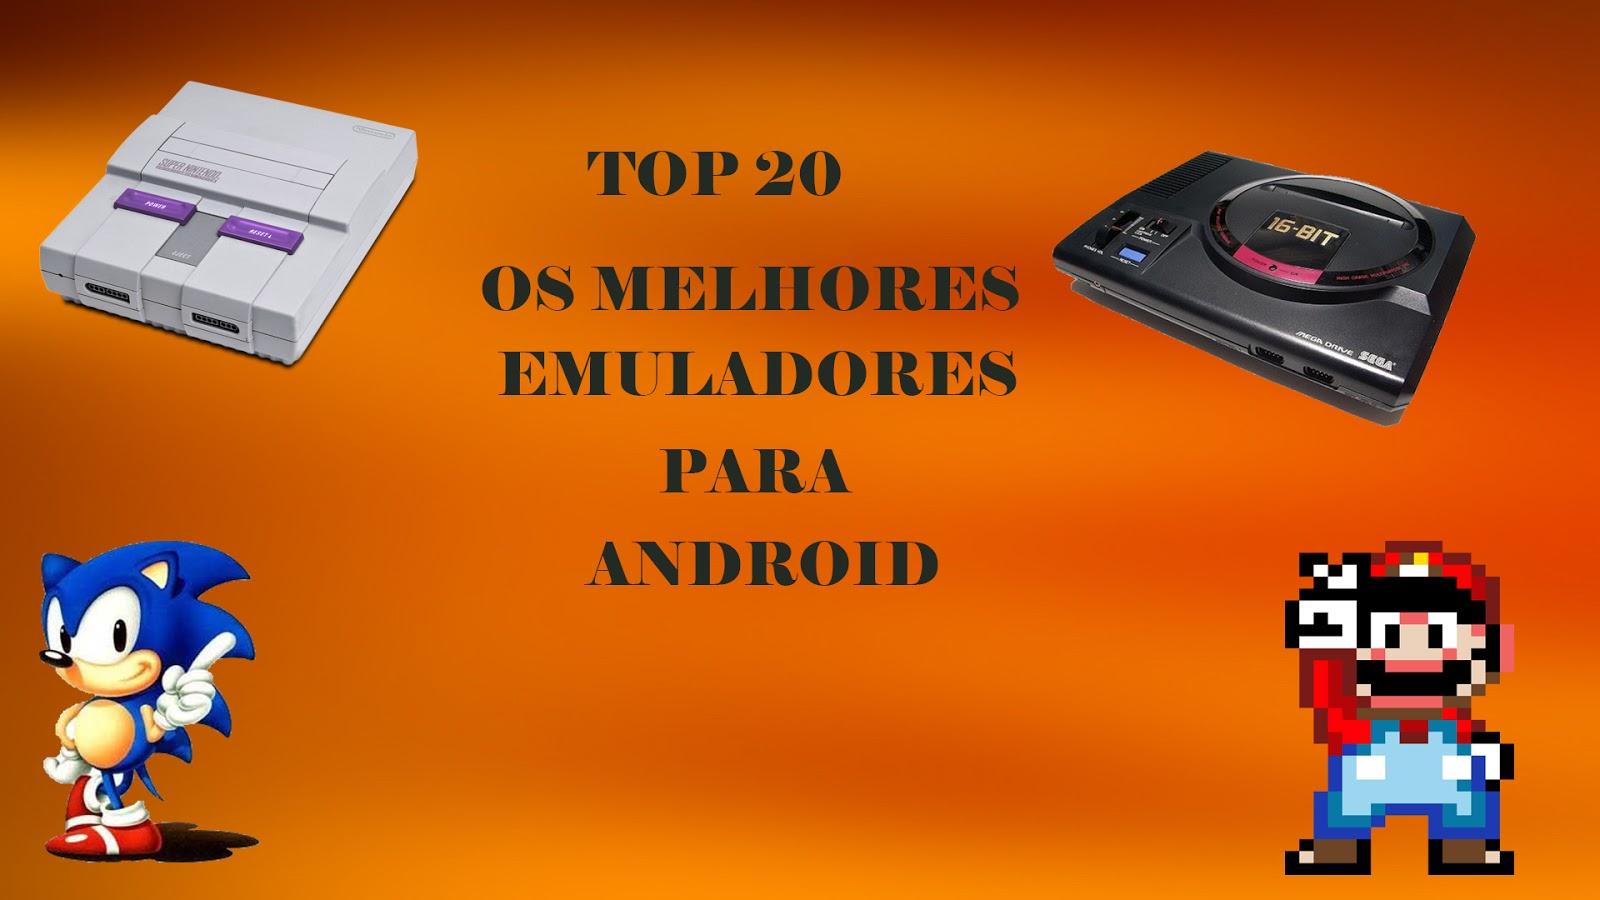 baixar emuladores para android gratis